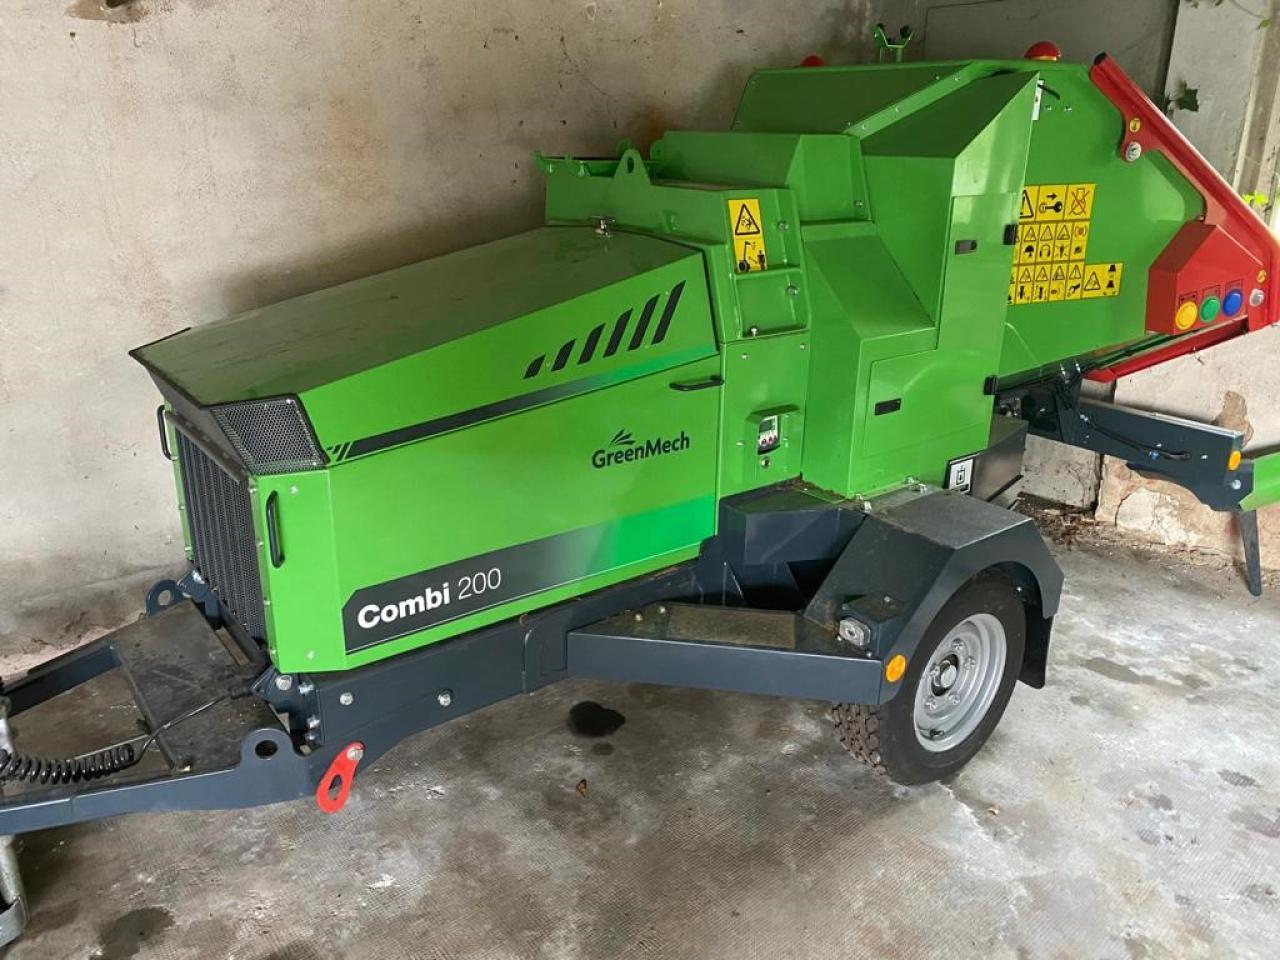 GreenMech Combi 200